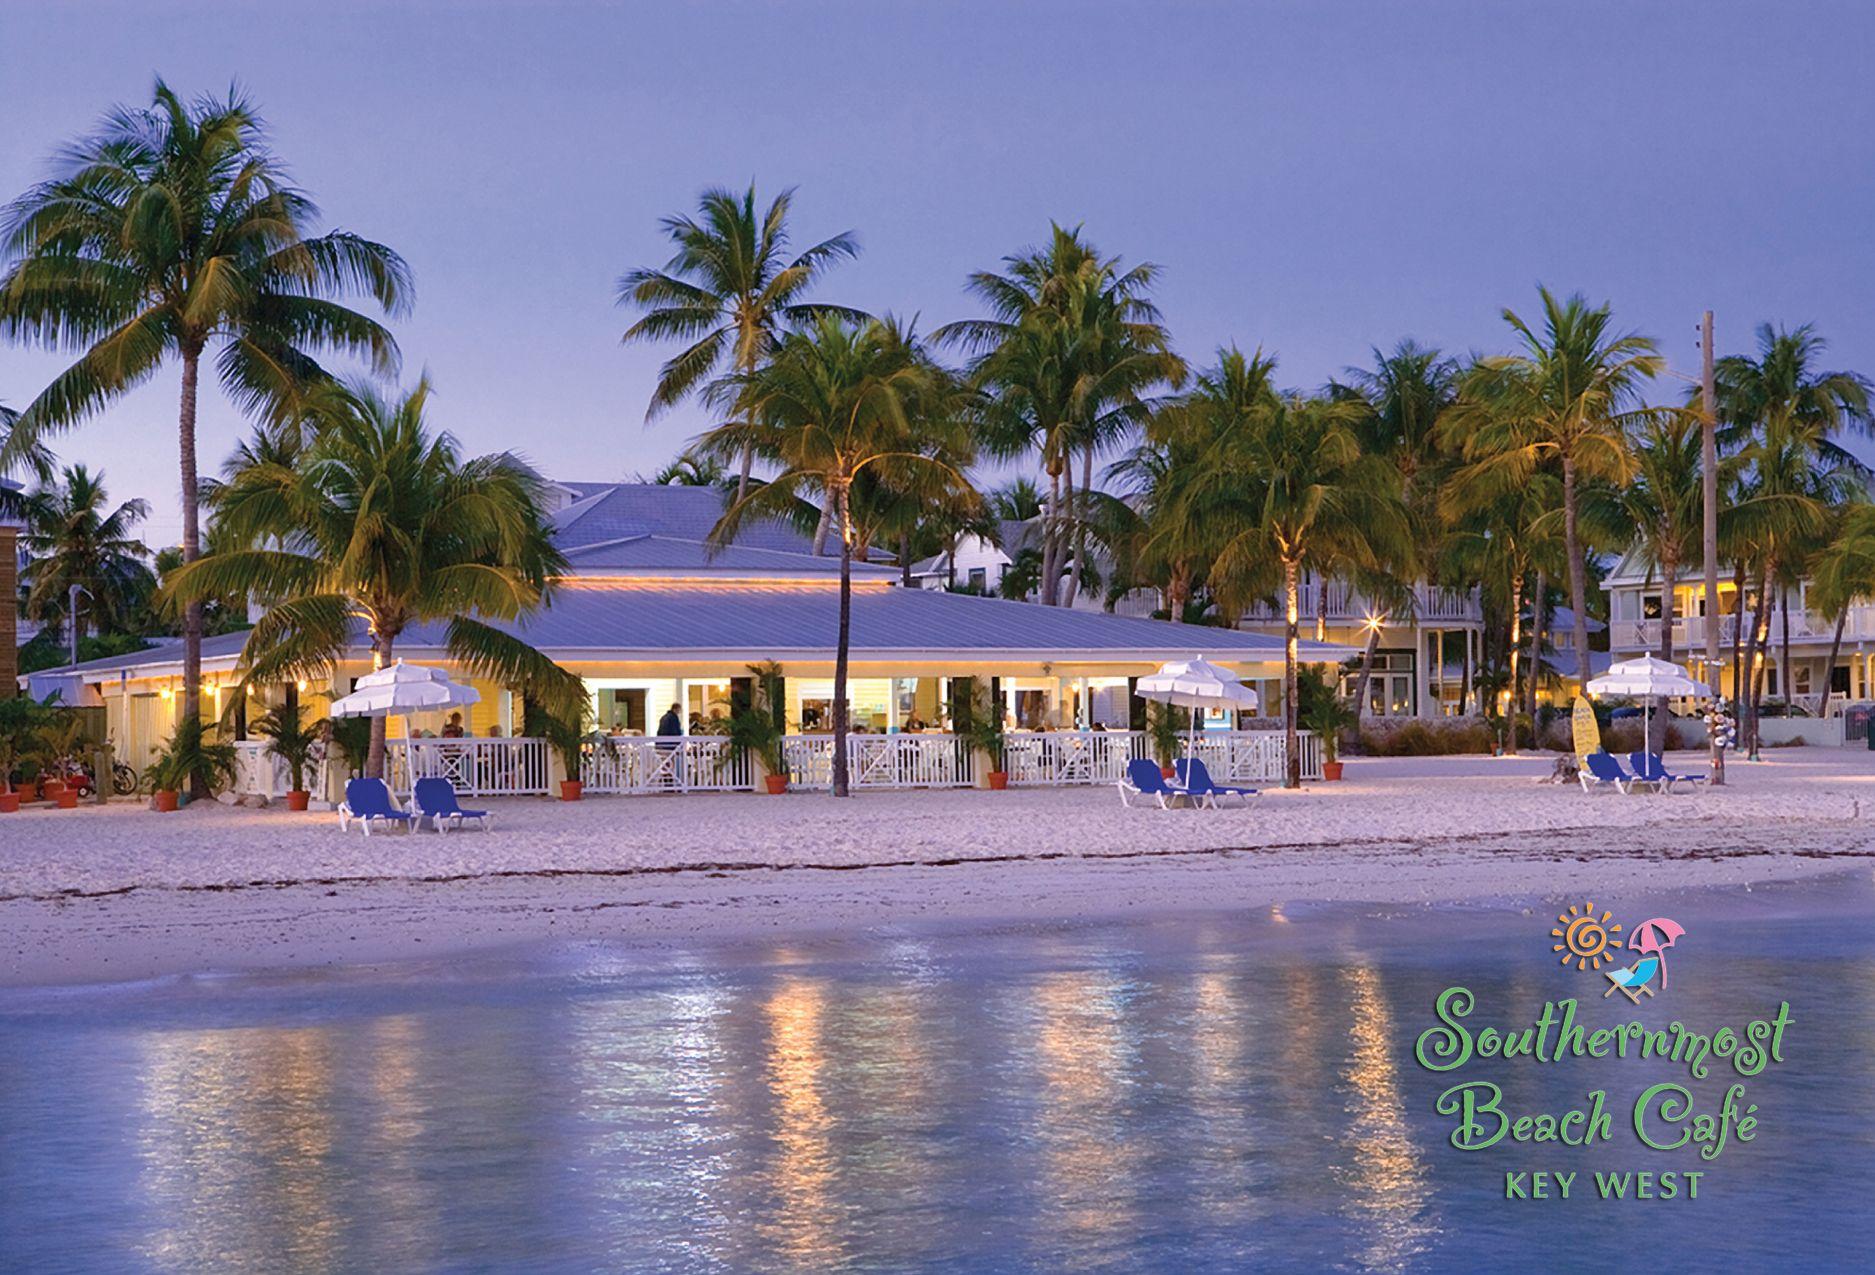 Southernmost Beach Cafe Key West Fl